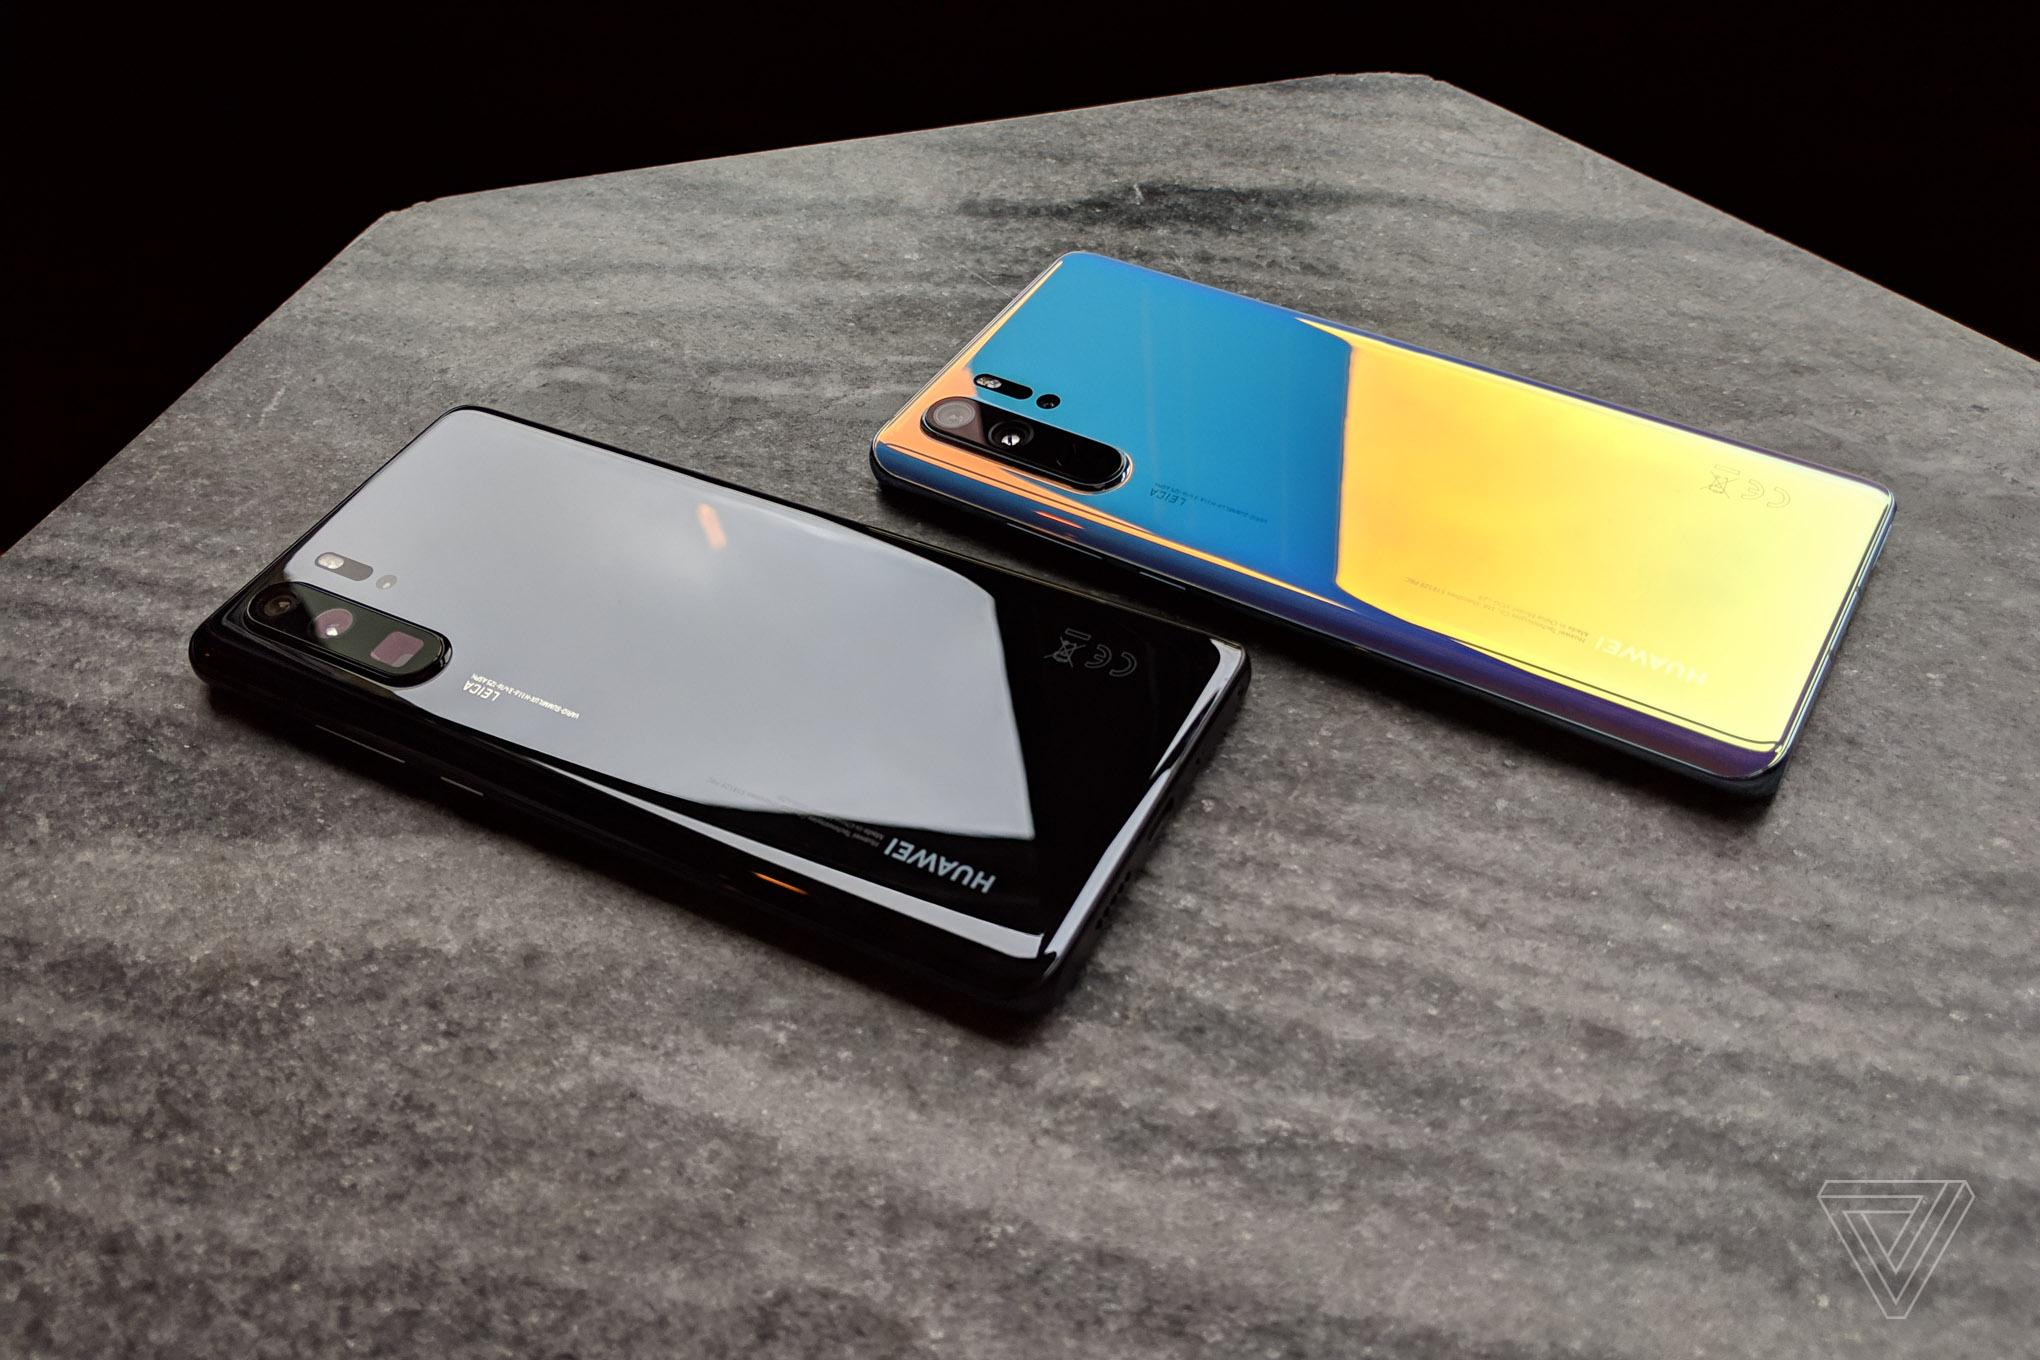 Huawei P30, P30 PRO, PRET, LANSARE, IMAGINI, NOUTATI, SPECIFICATII 1